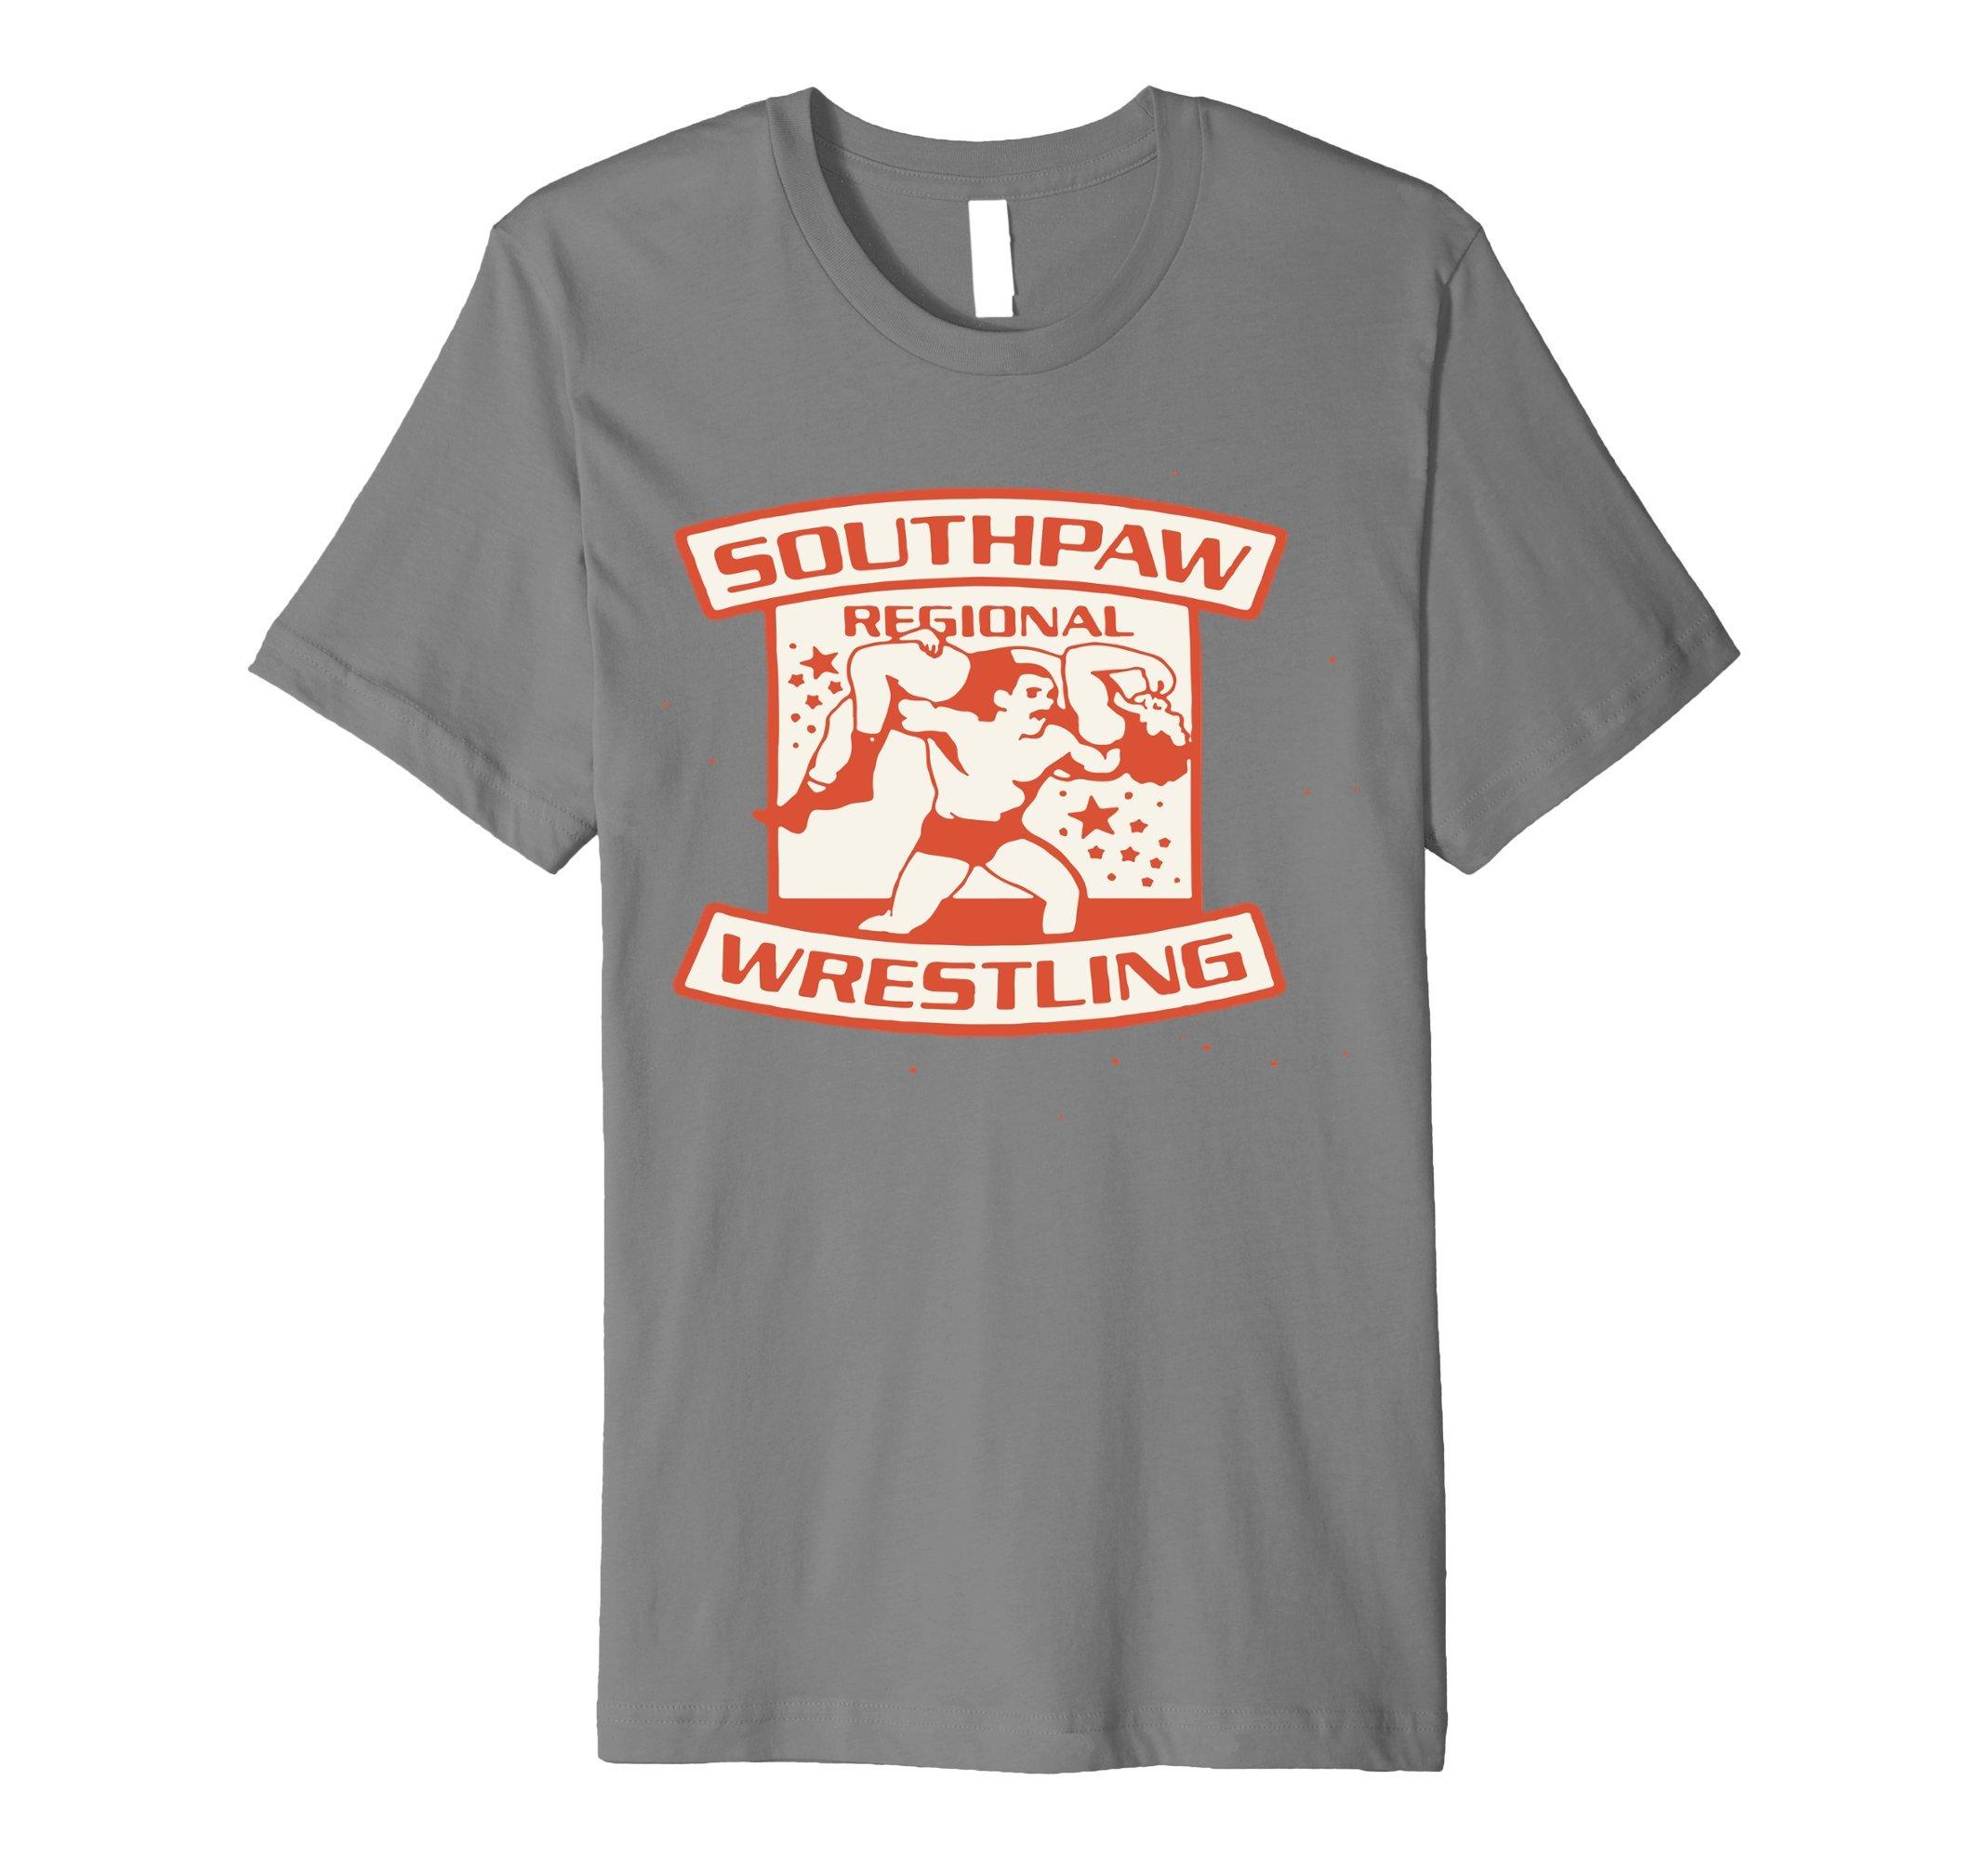 Mens Southpaw regional wrestling t shirt Large Slate by Southpaw regional wrestling t shirt